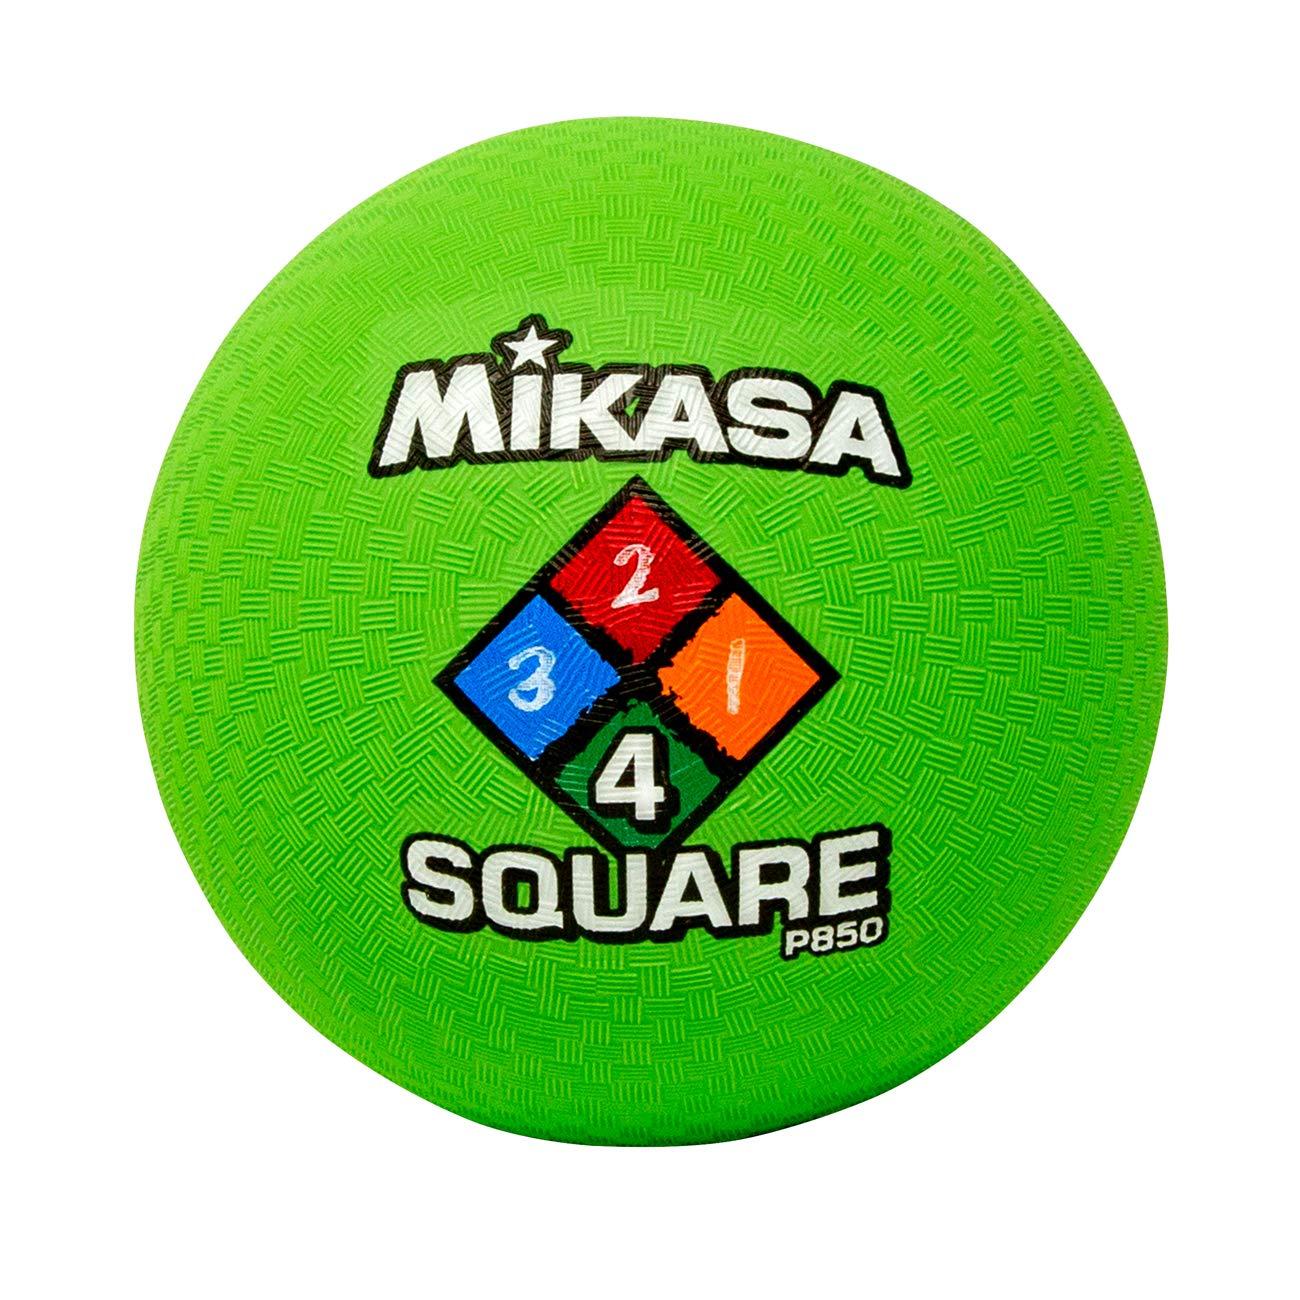 Mikasa D117 Foursquare Ball by Mikasa Sports